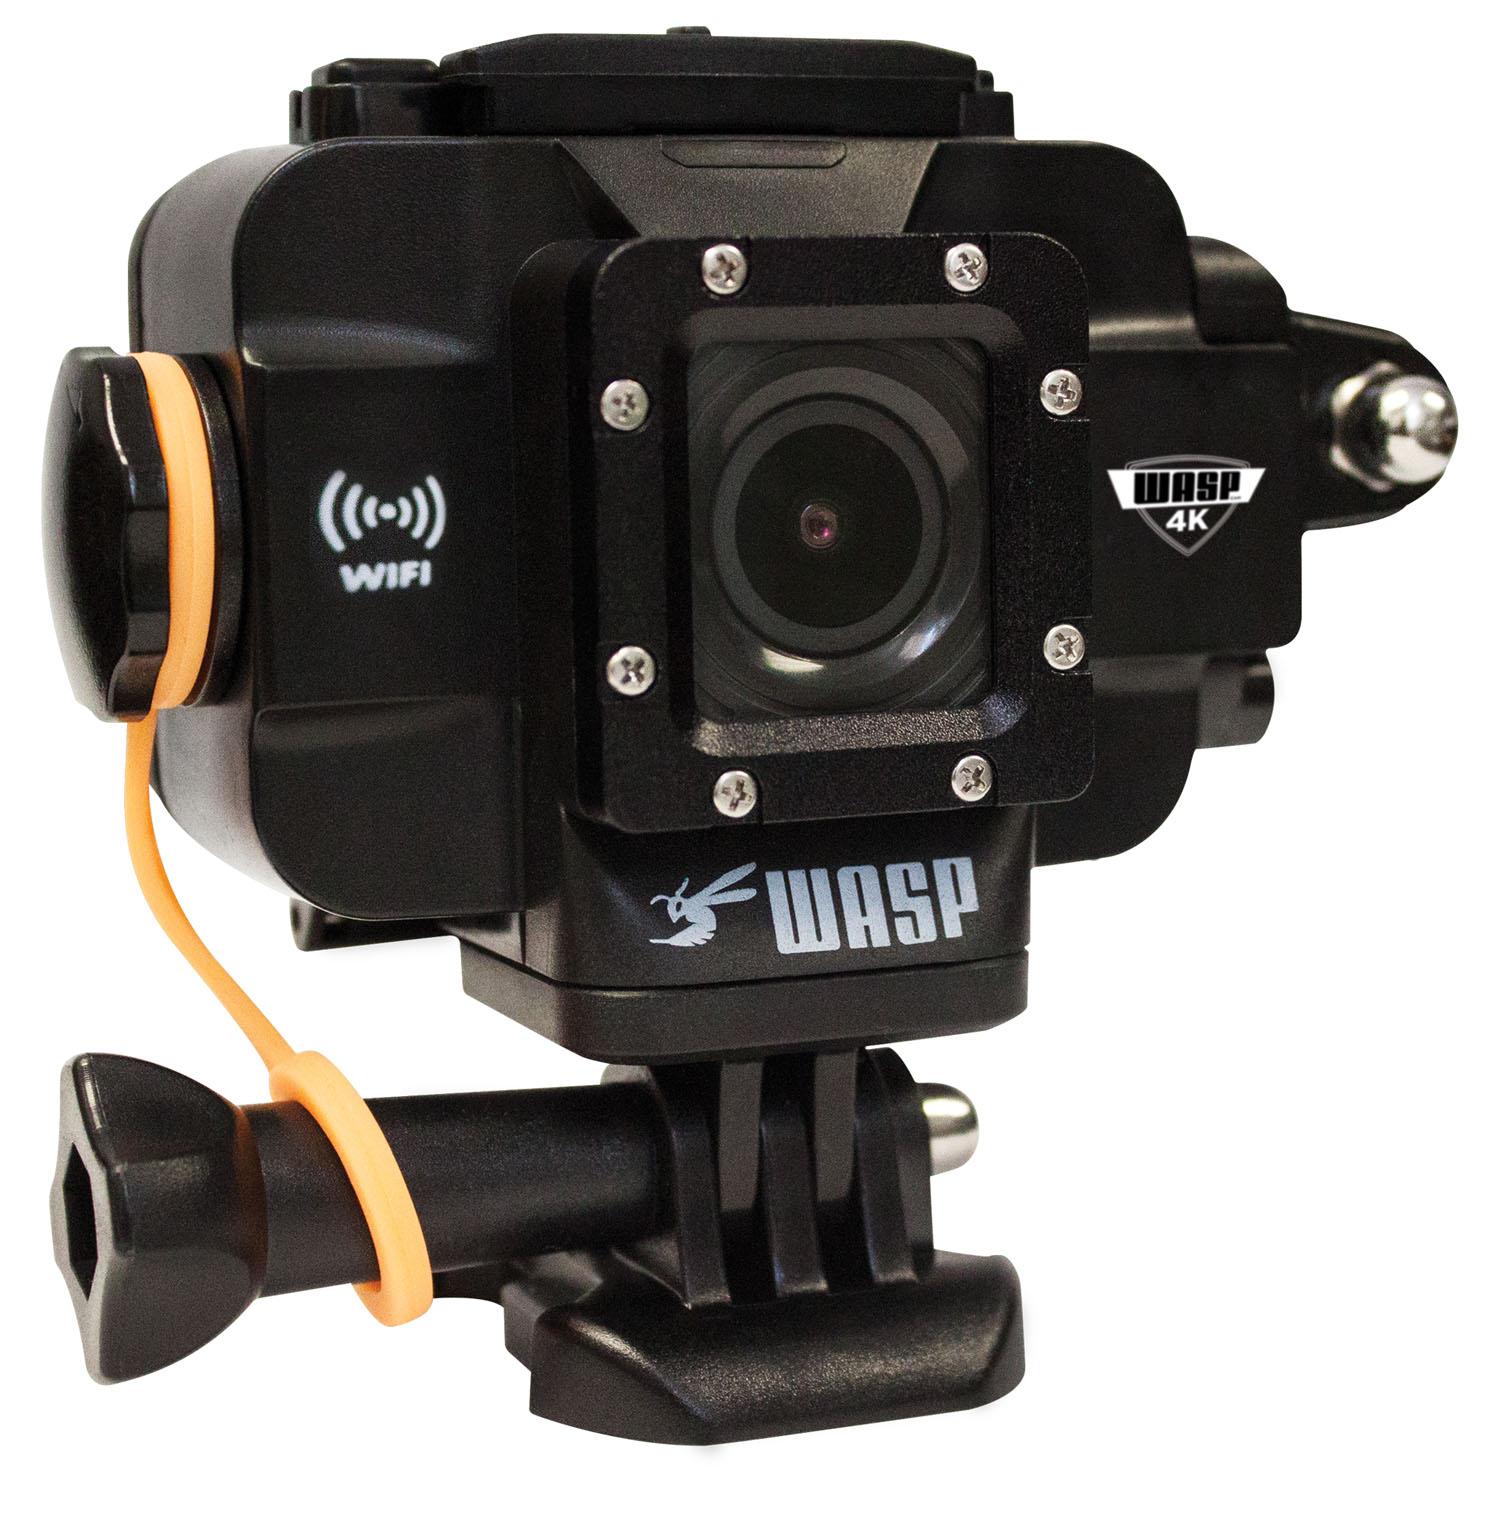 W9907 - Cobra® Wasp Sports Action Camera